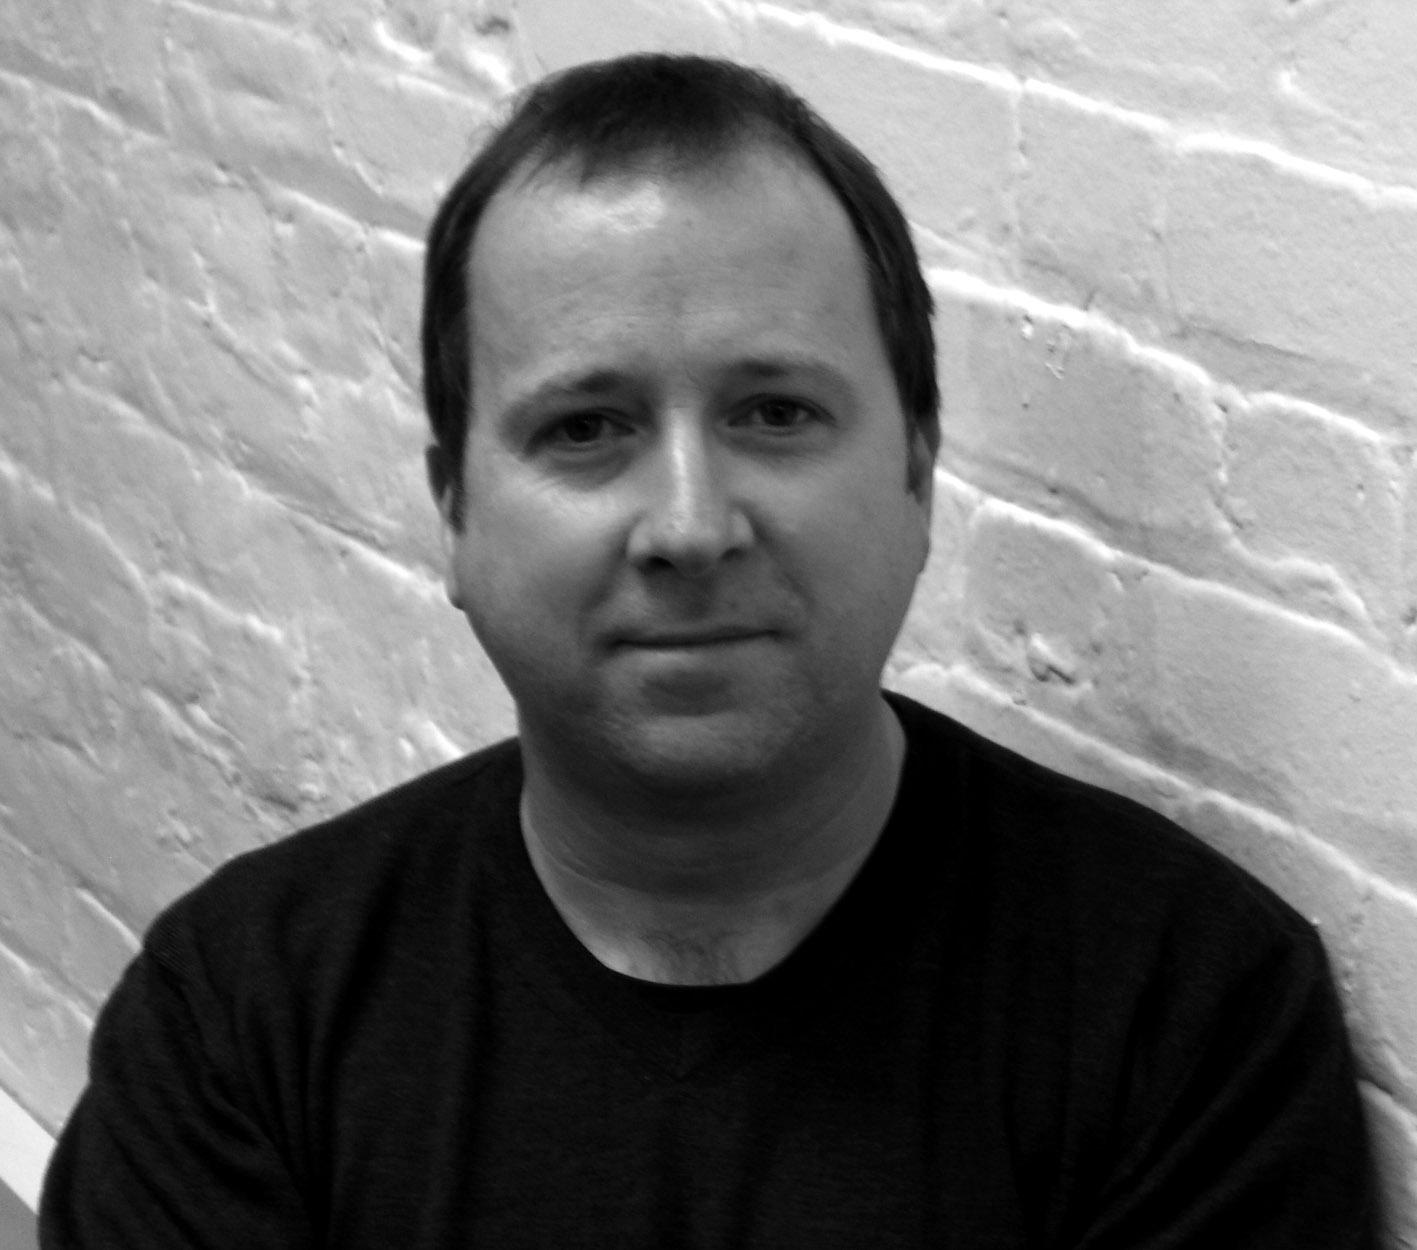 image of Damian Evans